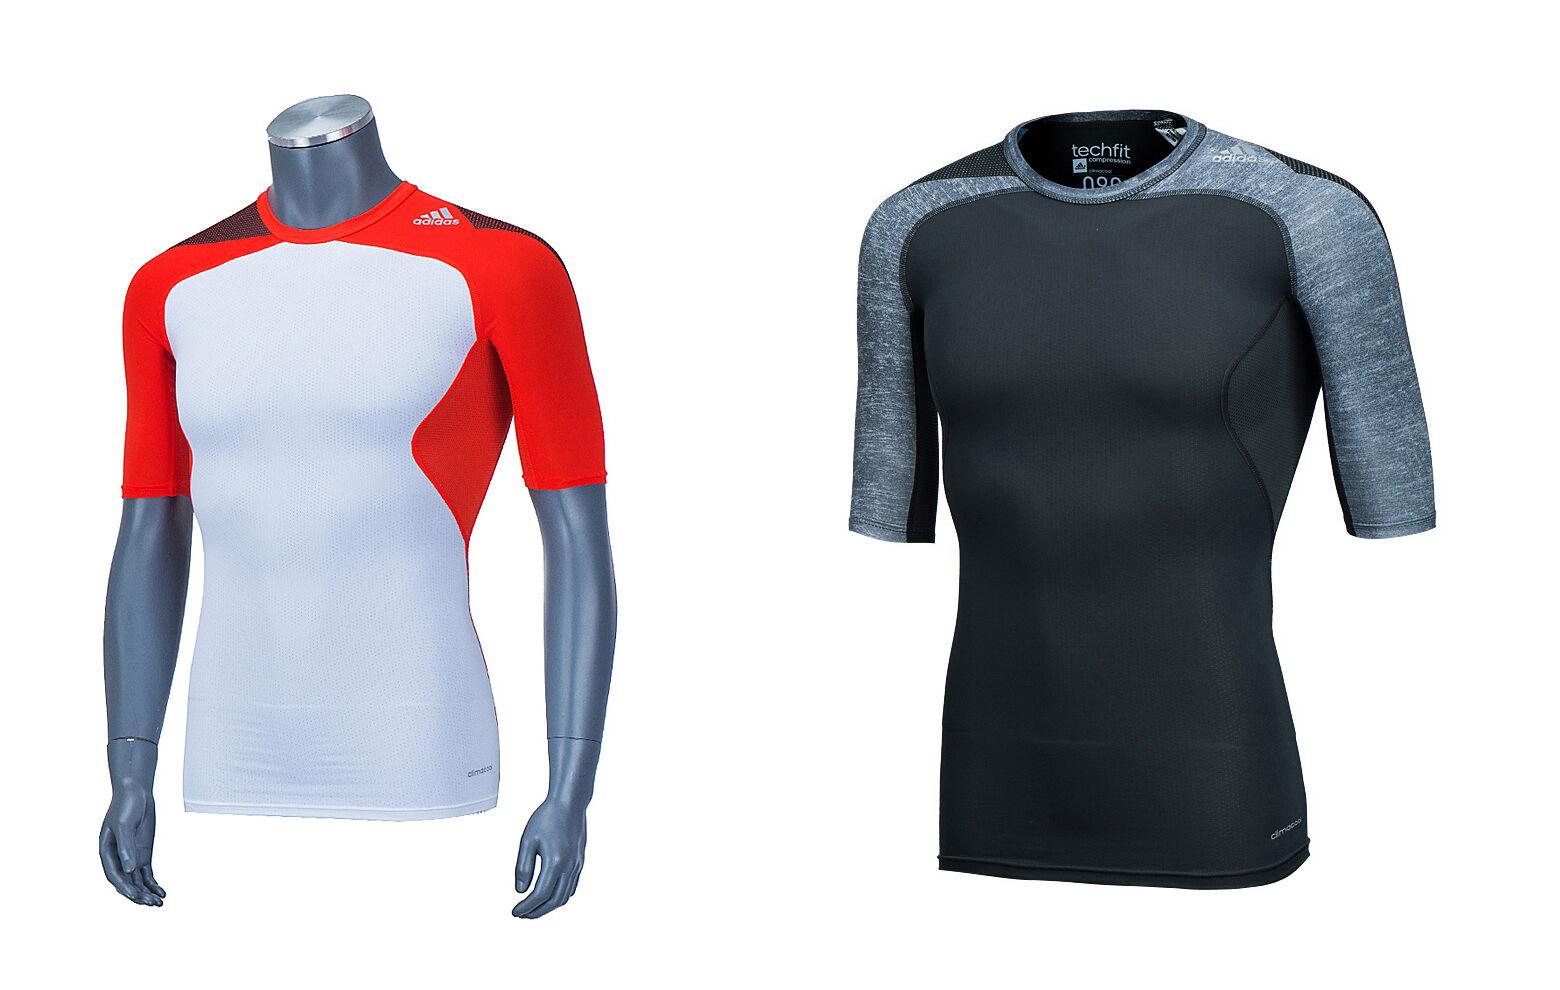 Adidas Techfit Cool S S de súperdry M66502 S19444 Fútbol Gimnasio Climacool T-Shirts